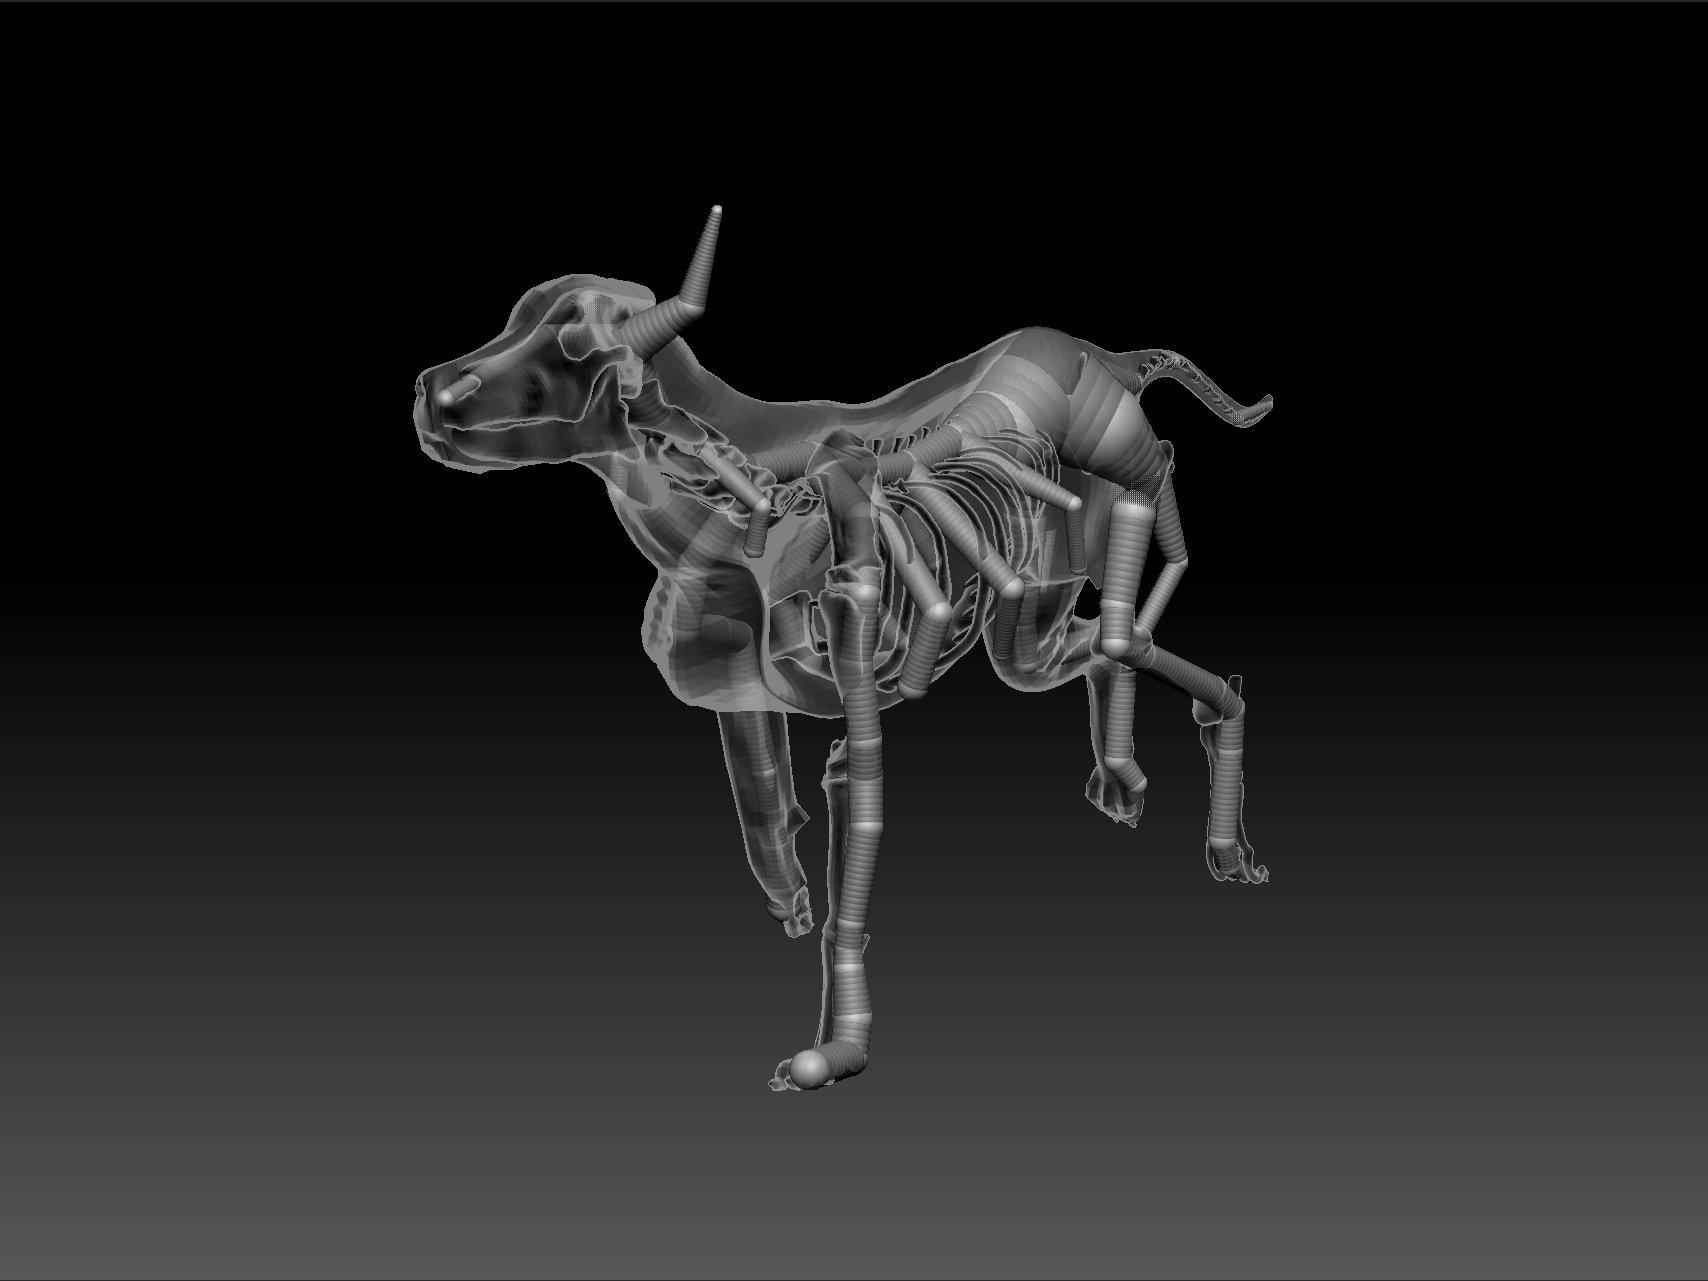 Dog Anatomy 3d Gallery - human body anatomy